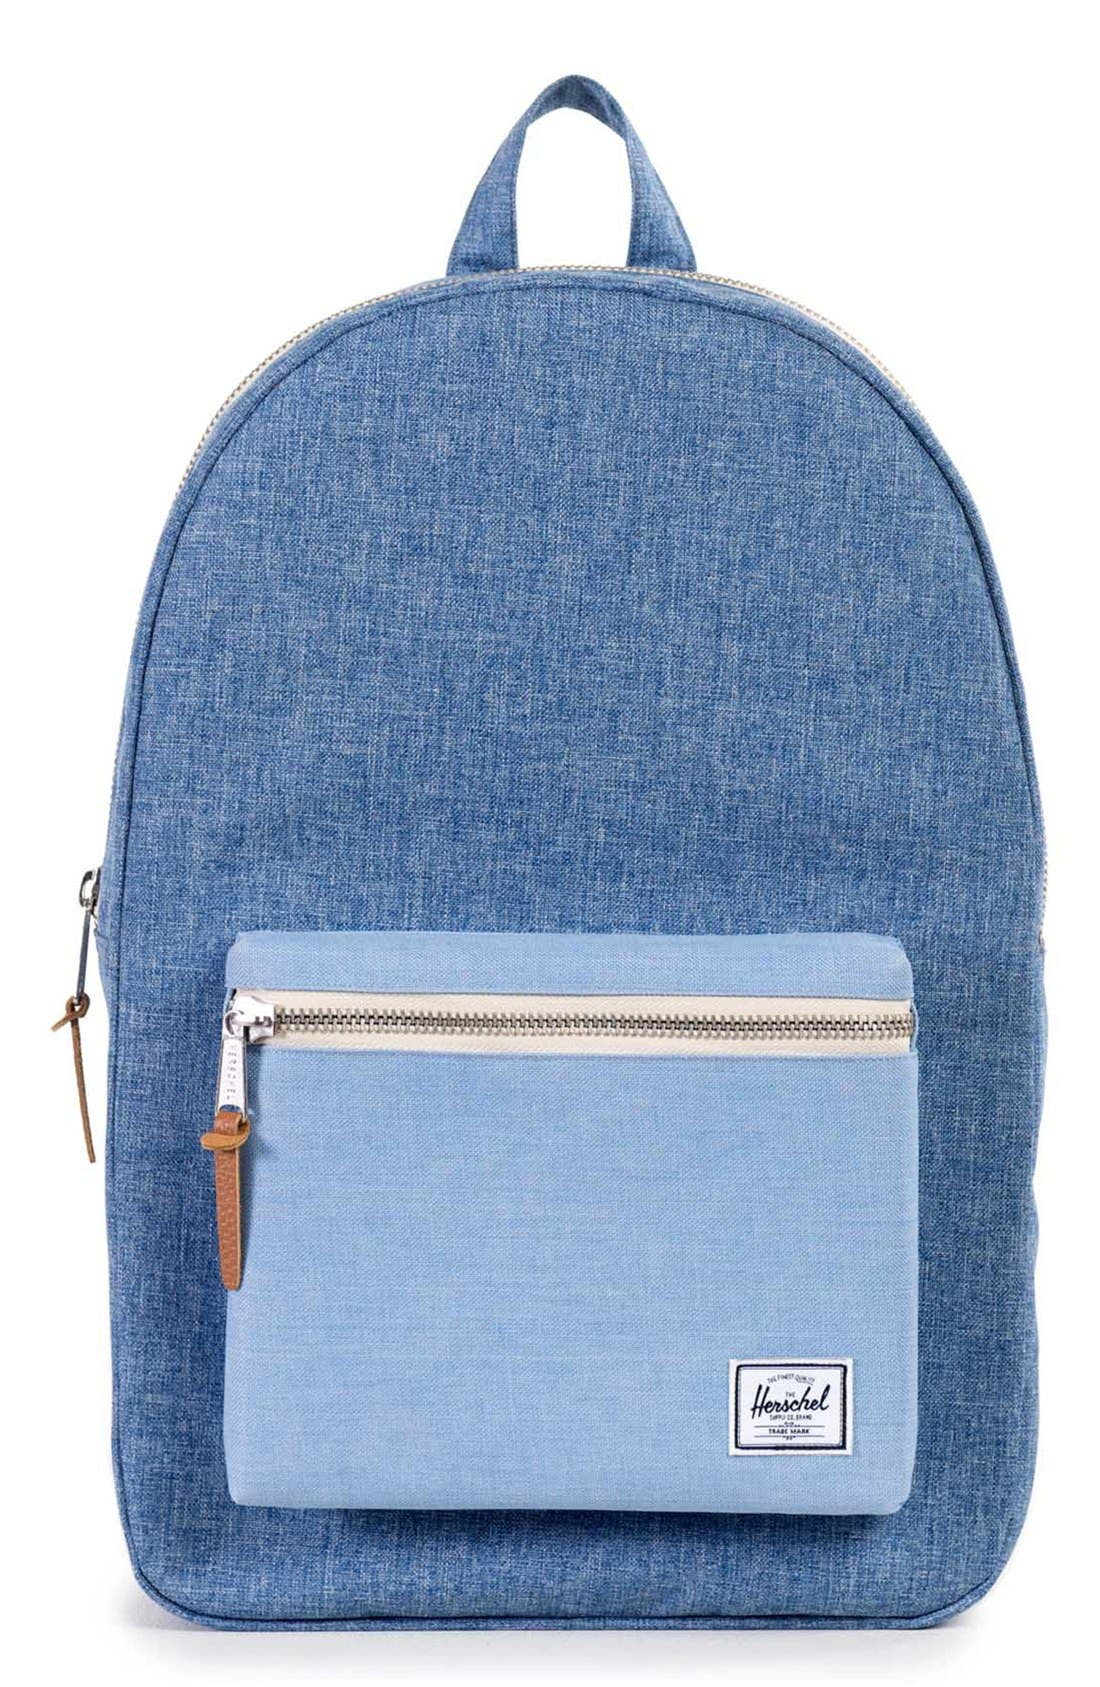 Main Image - Herschel Supply Co. 'Settlement' Backpack